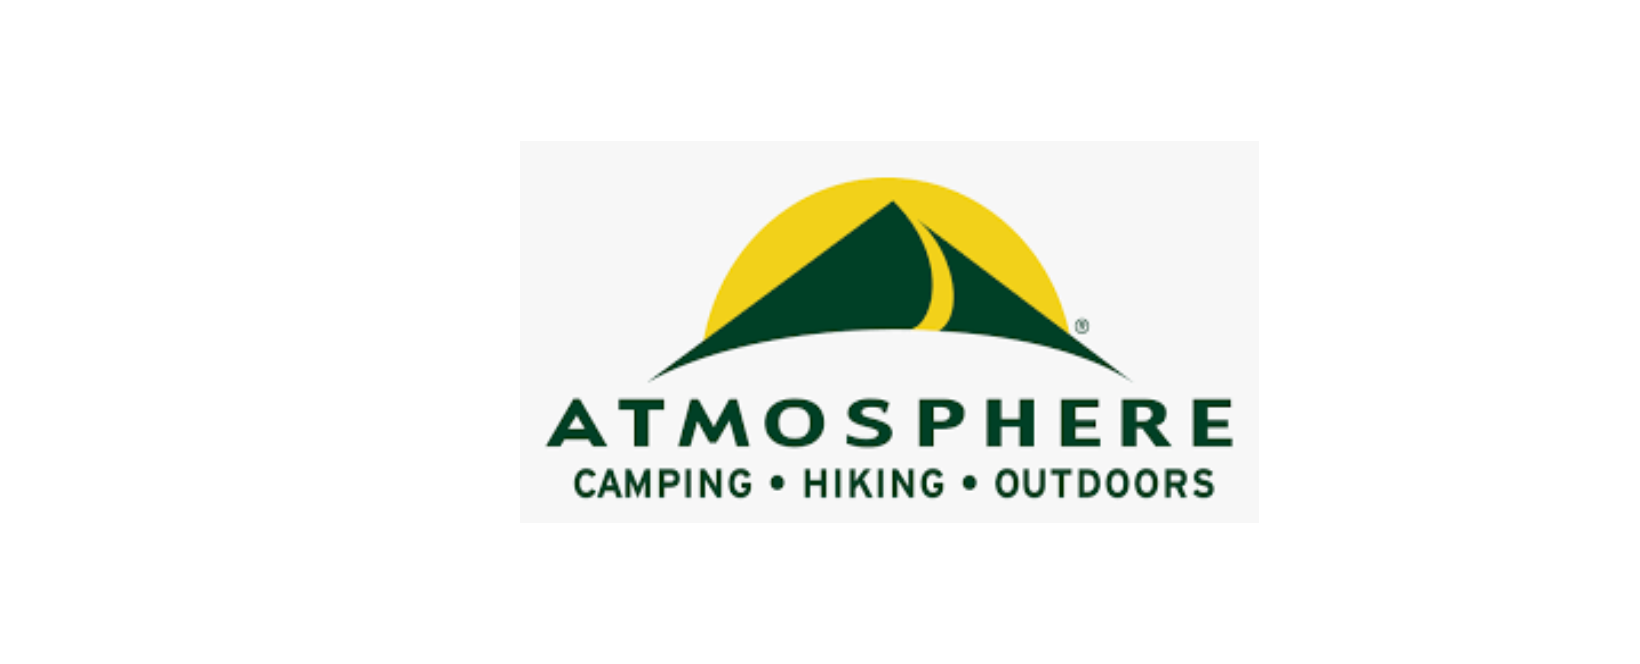 Atmosphere Discount Code 2021